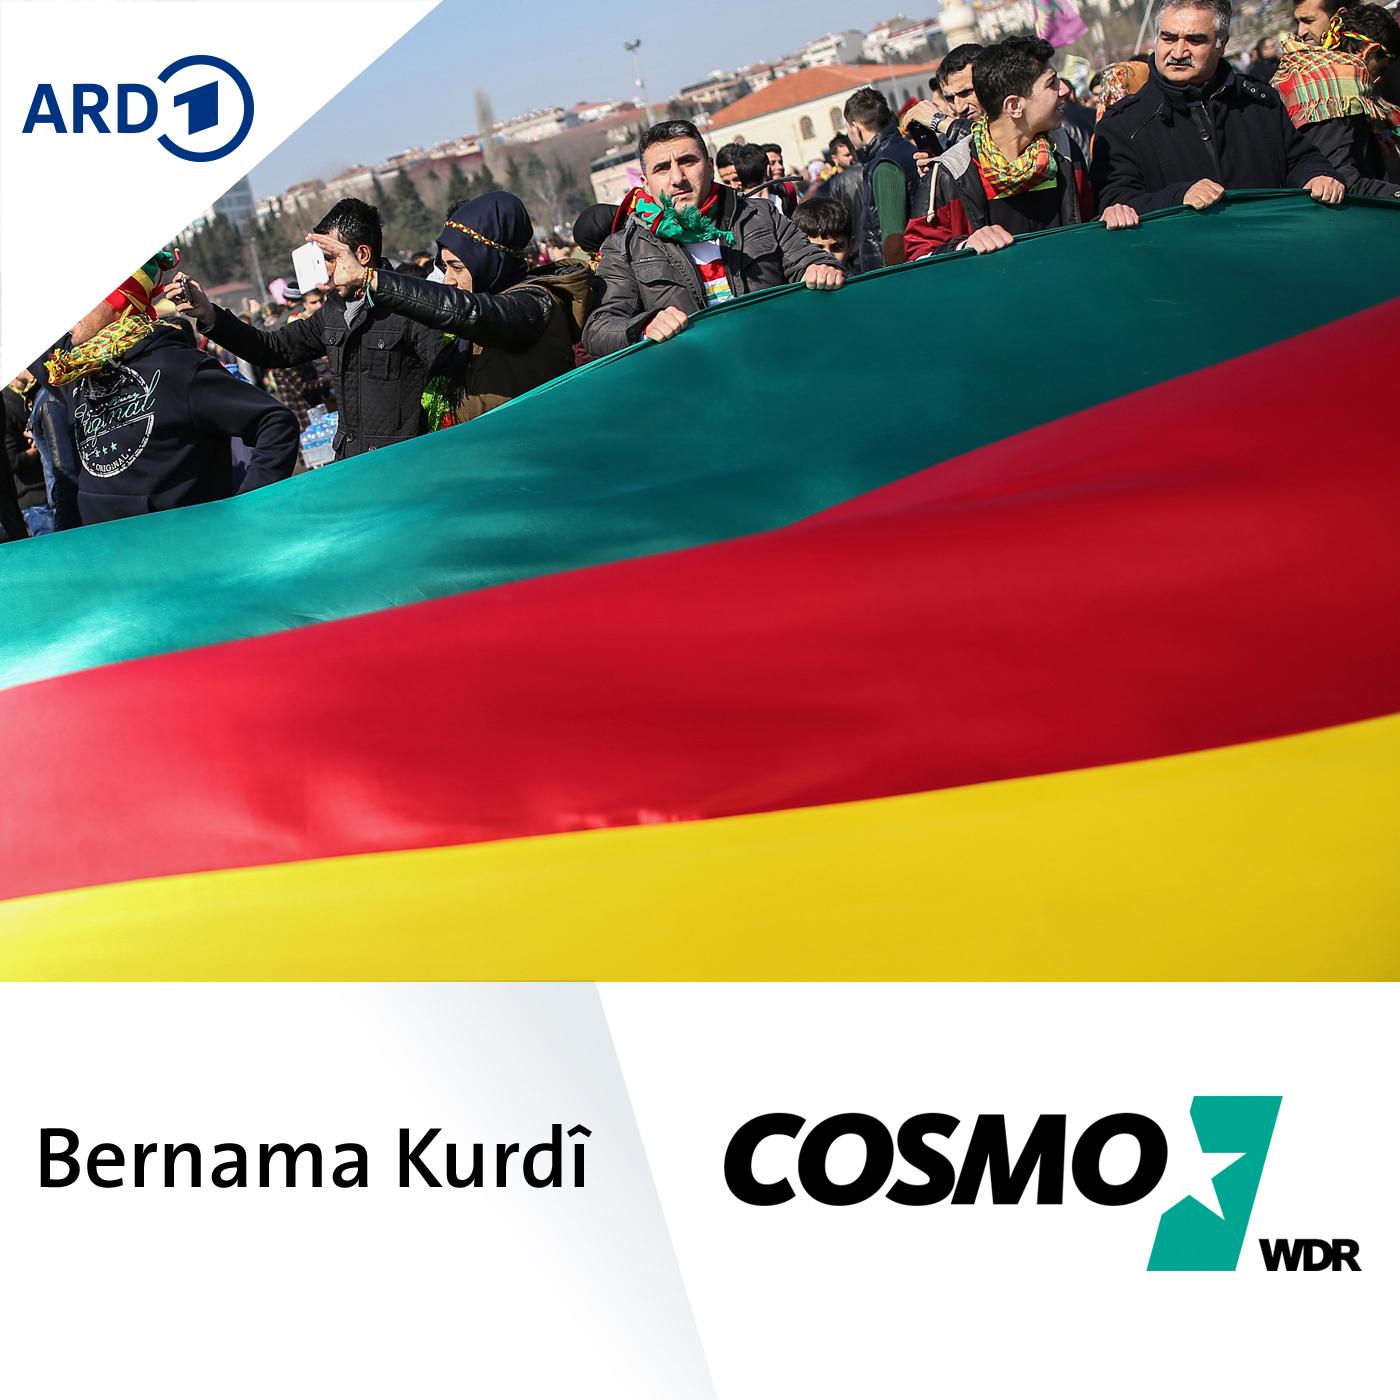 COSMO Bernama Kurdî - Beiträge